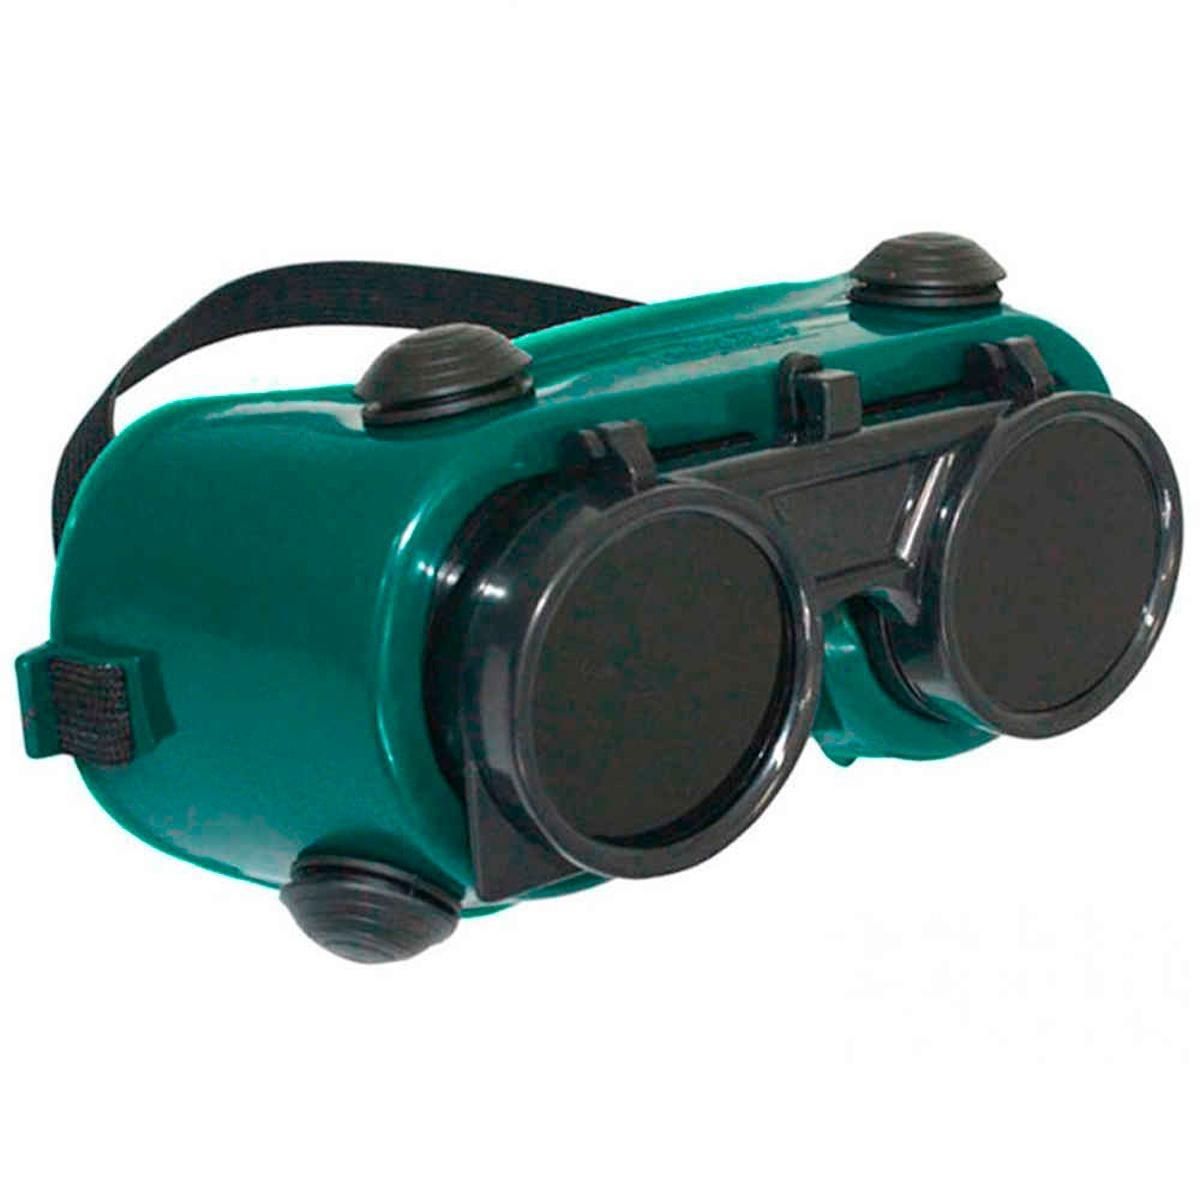 b87dd1fc267e3 óculos de solda cg250 carbografite redondo, visor articulado. Carregando  zoom.